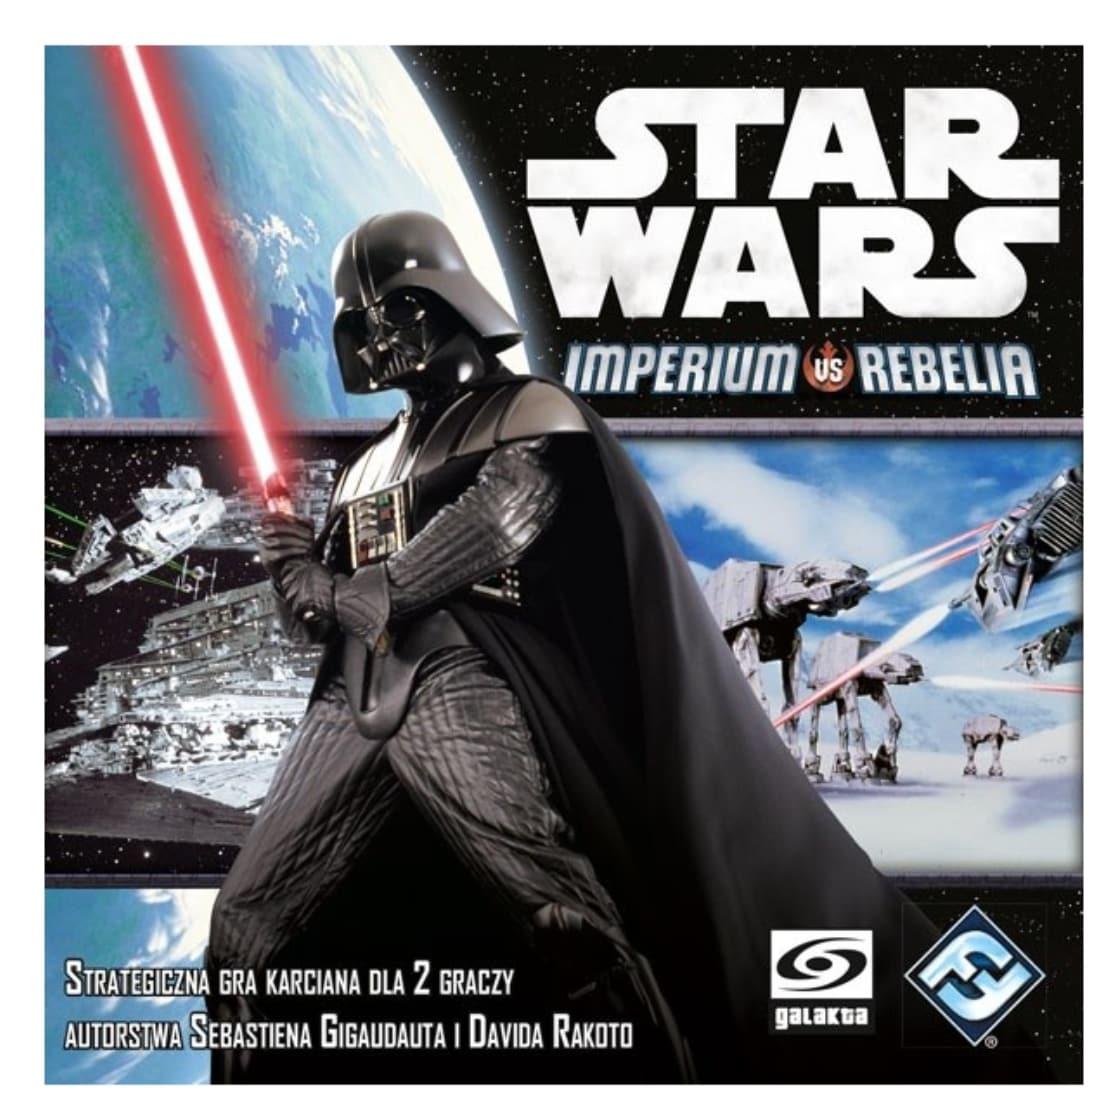 STAR WARS IMPERIUM vs REBELIA - 1